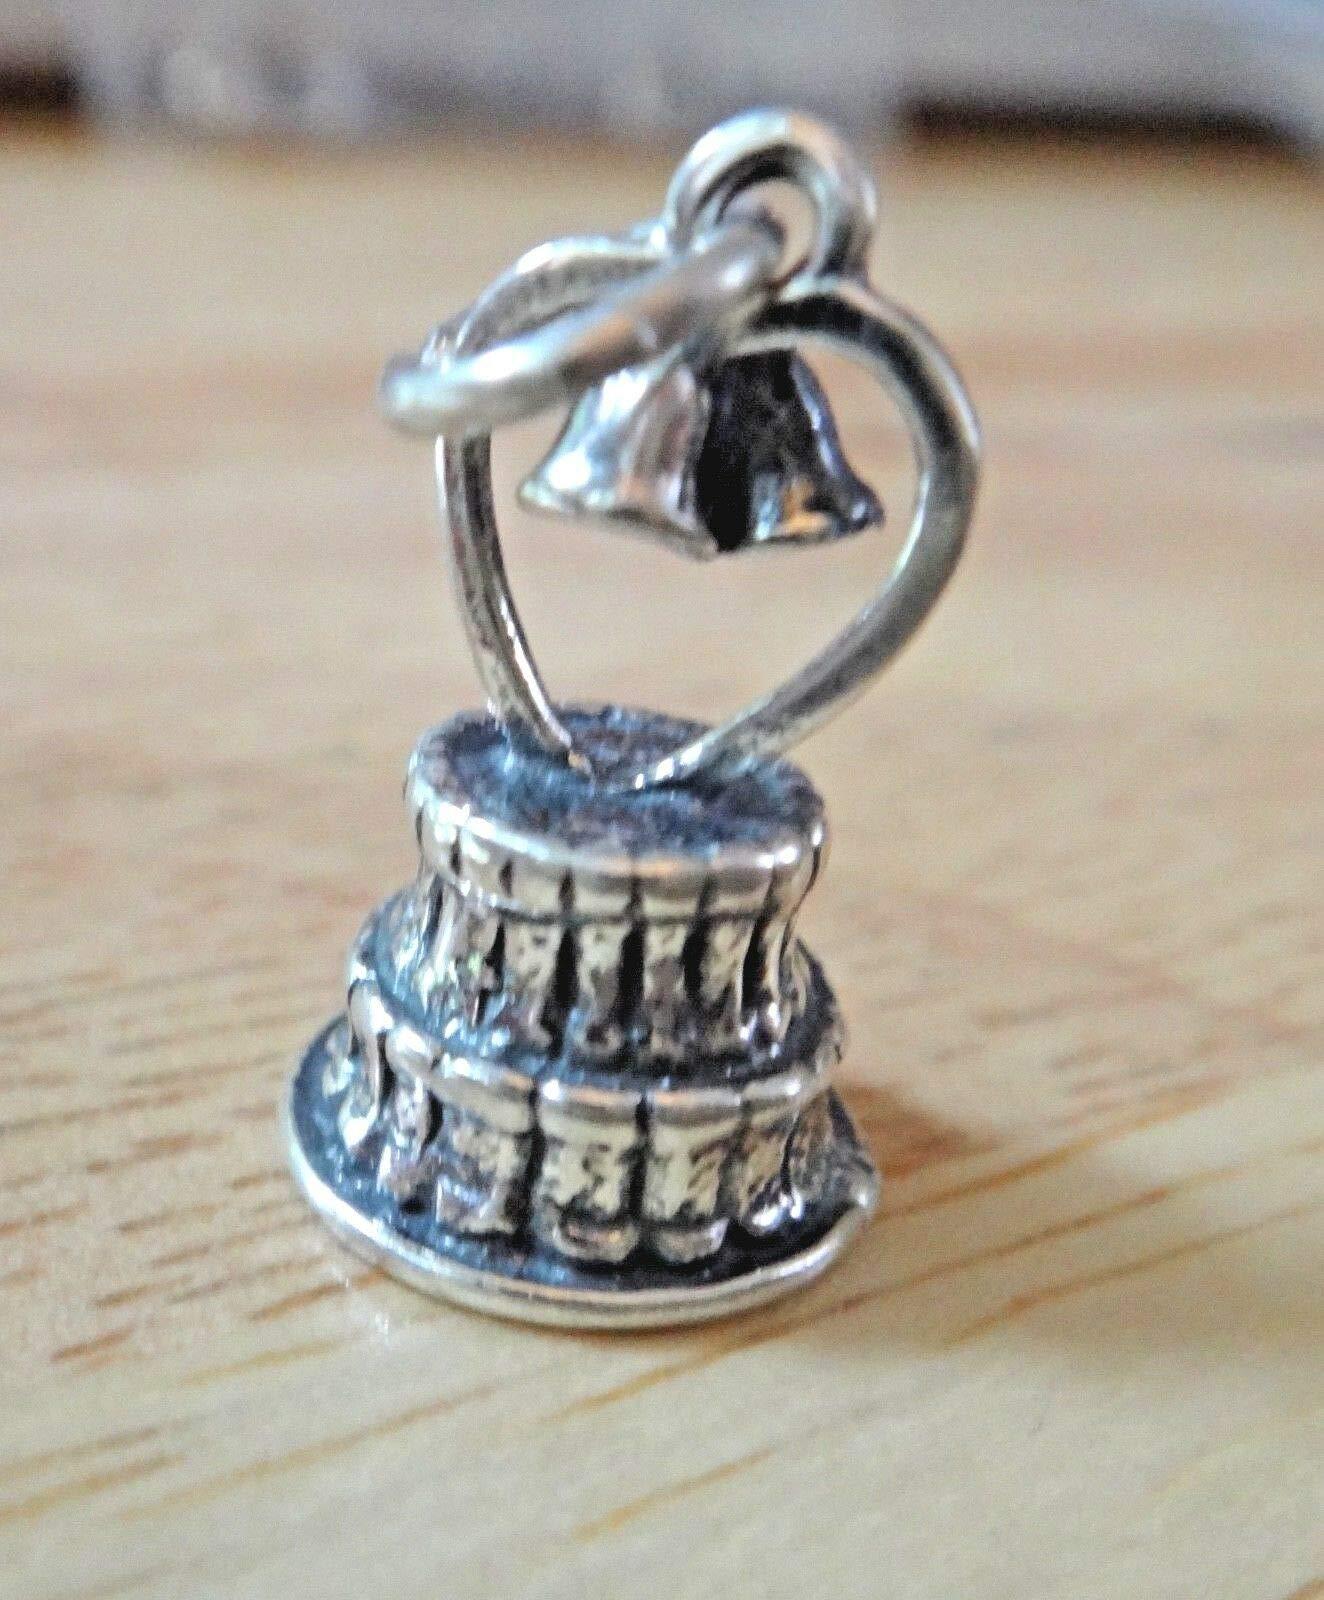 Fine Charms Sterling Silver 3D 19mm Wedding Cake w/Bells Cake Topper Top Bride Groom